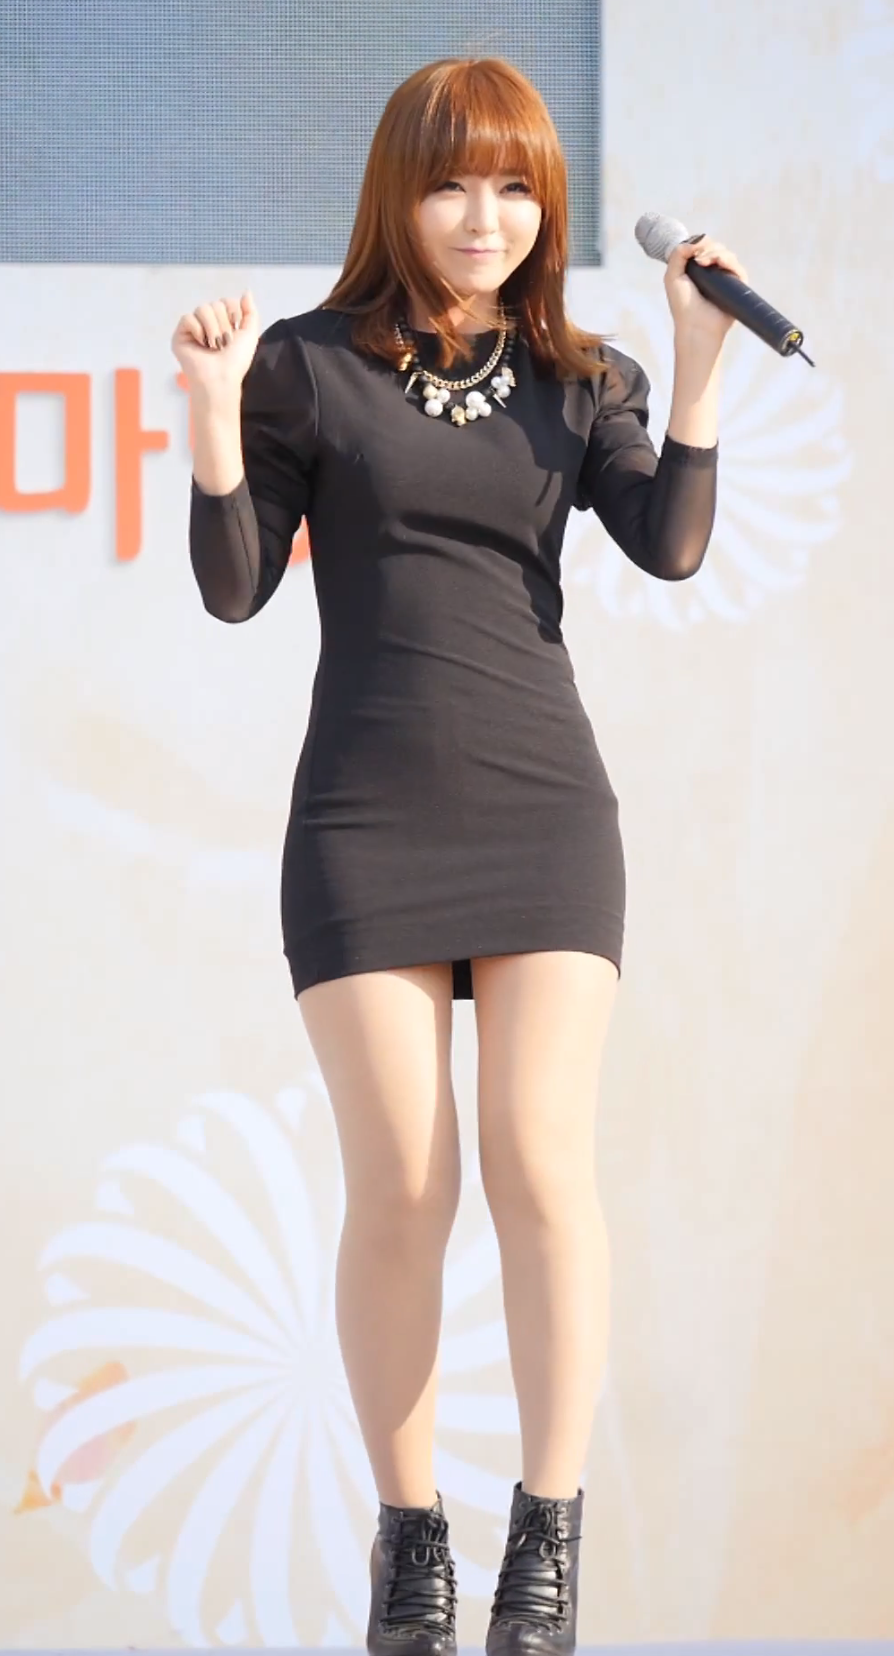 hot nake korean women